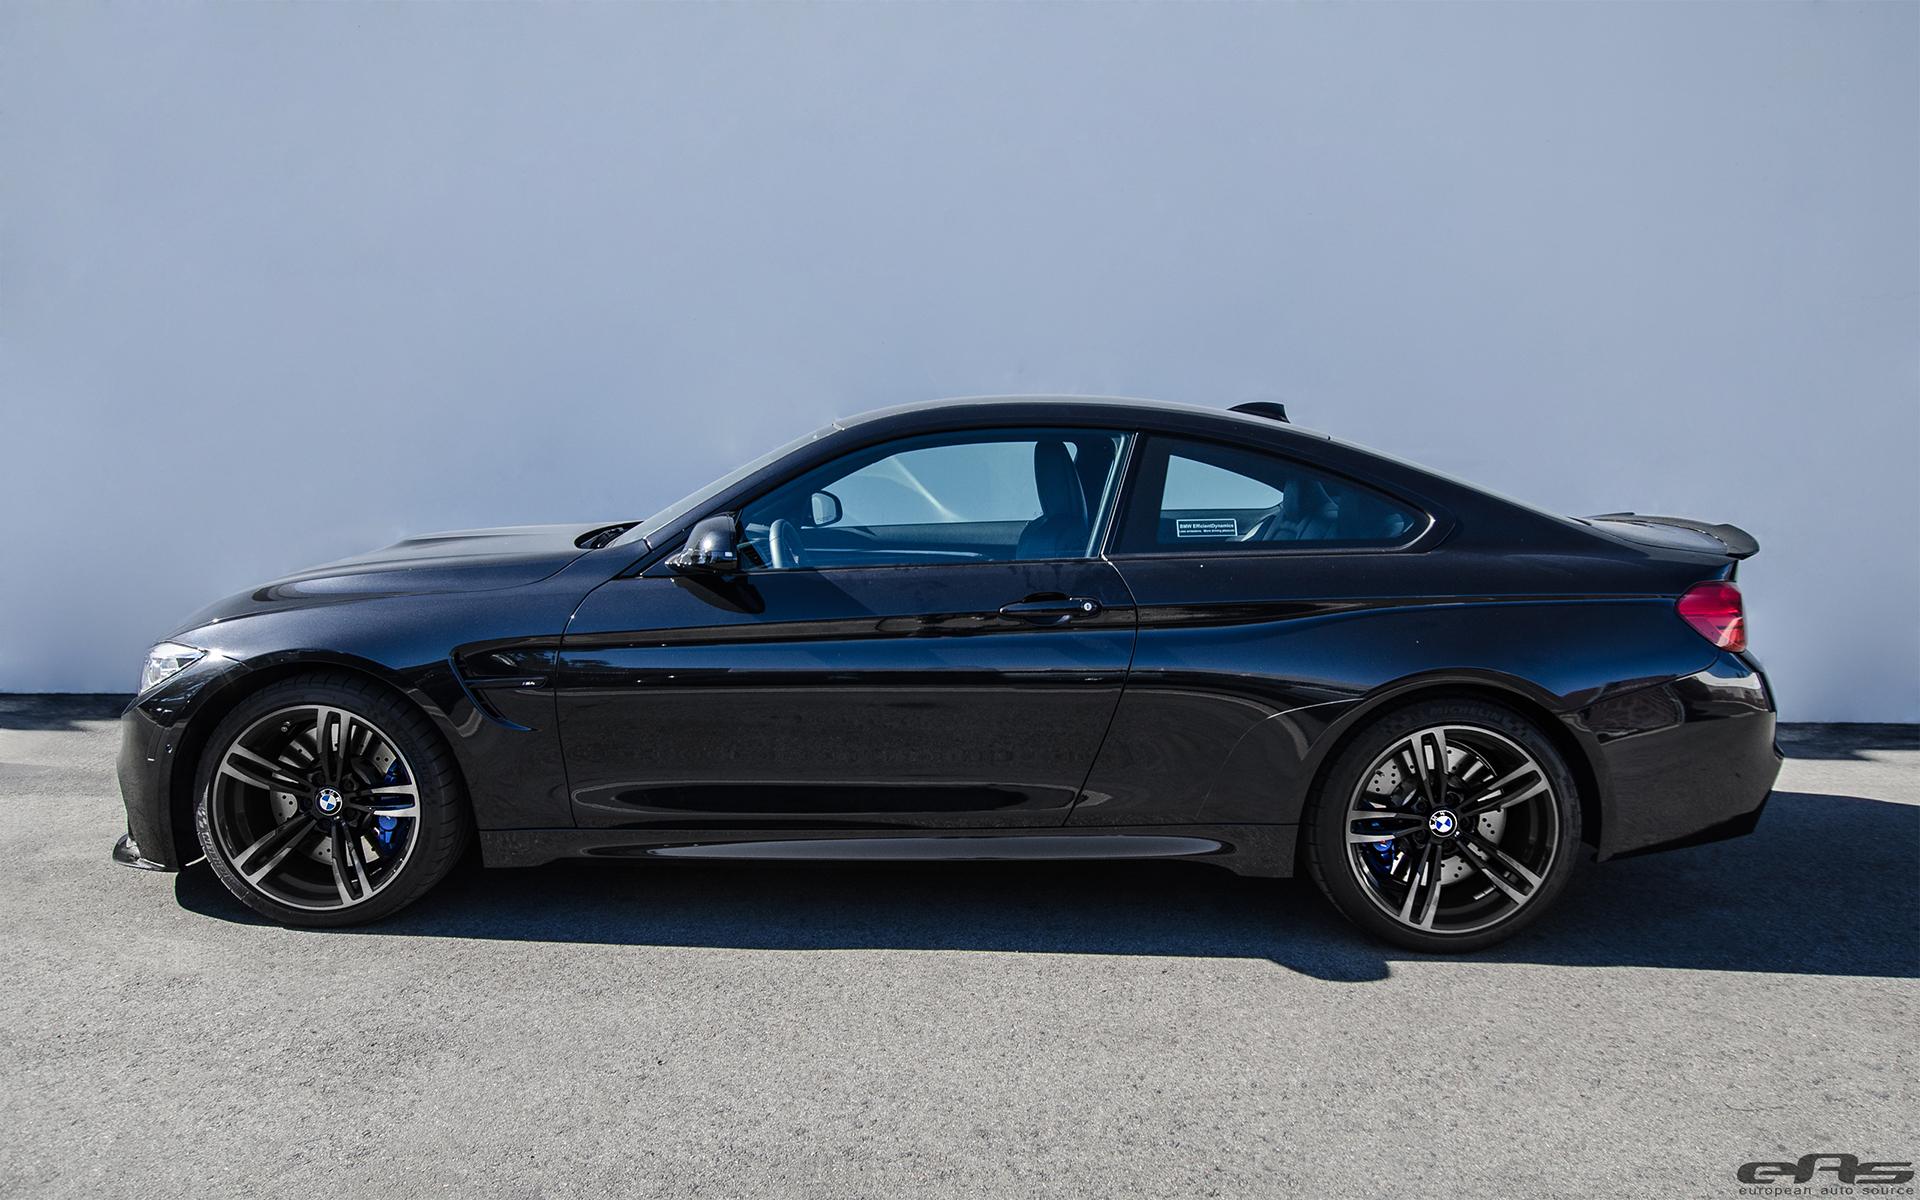 Black Sapphire Metallic M4 With Carbon Fiber Aerodynamic Parts